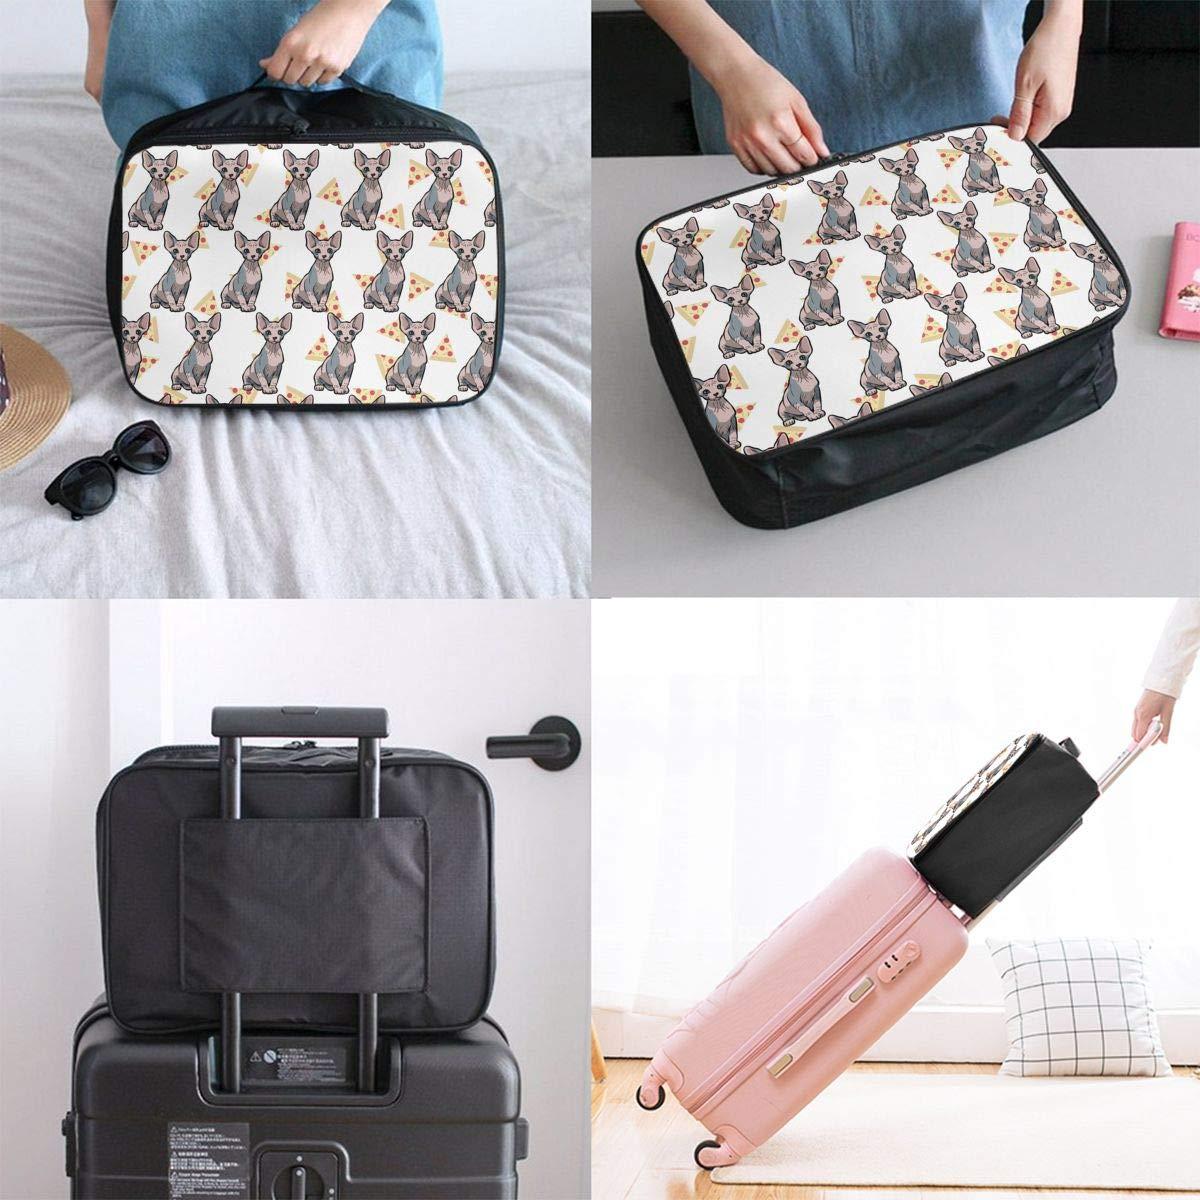 Sphynx Cat Taco Travel Duffel Bag Casual Large Capacity Portable Luggage Bag Suitcase Storage Bag Luggage Packing Tote Bag Weekend Trip